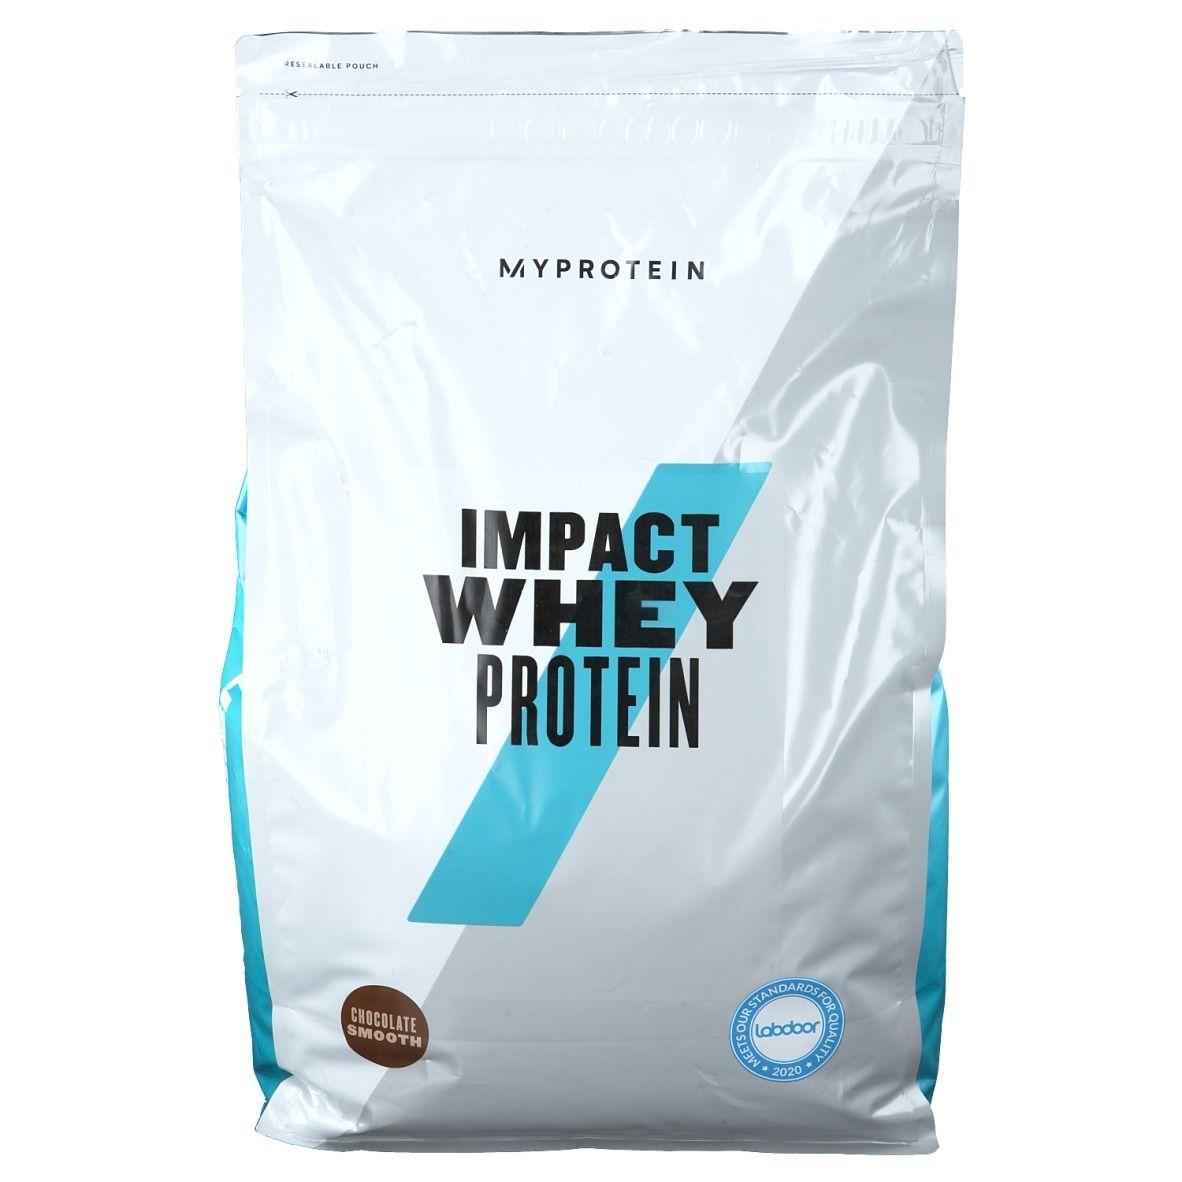 MyProtein® Impact Whey Protein Chocolat Smooth g poudre